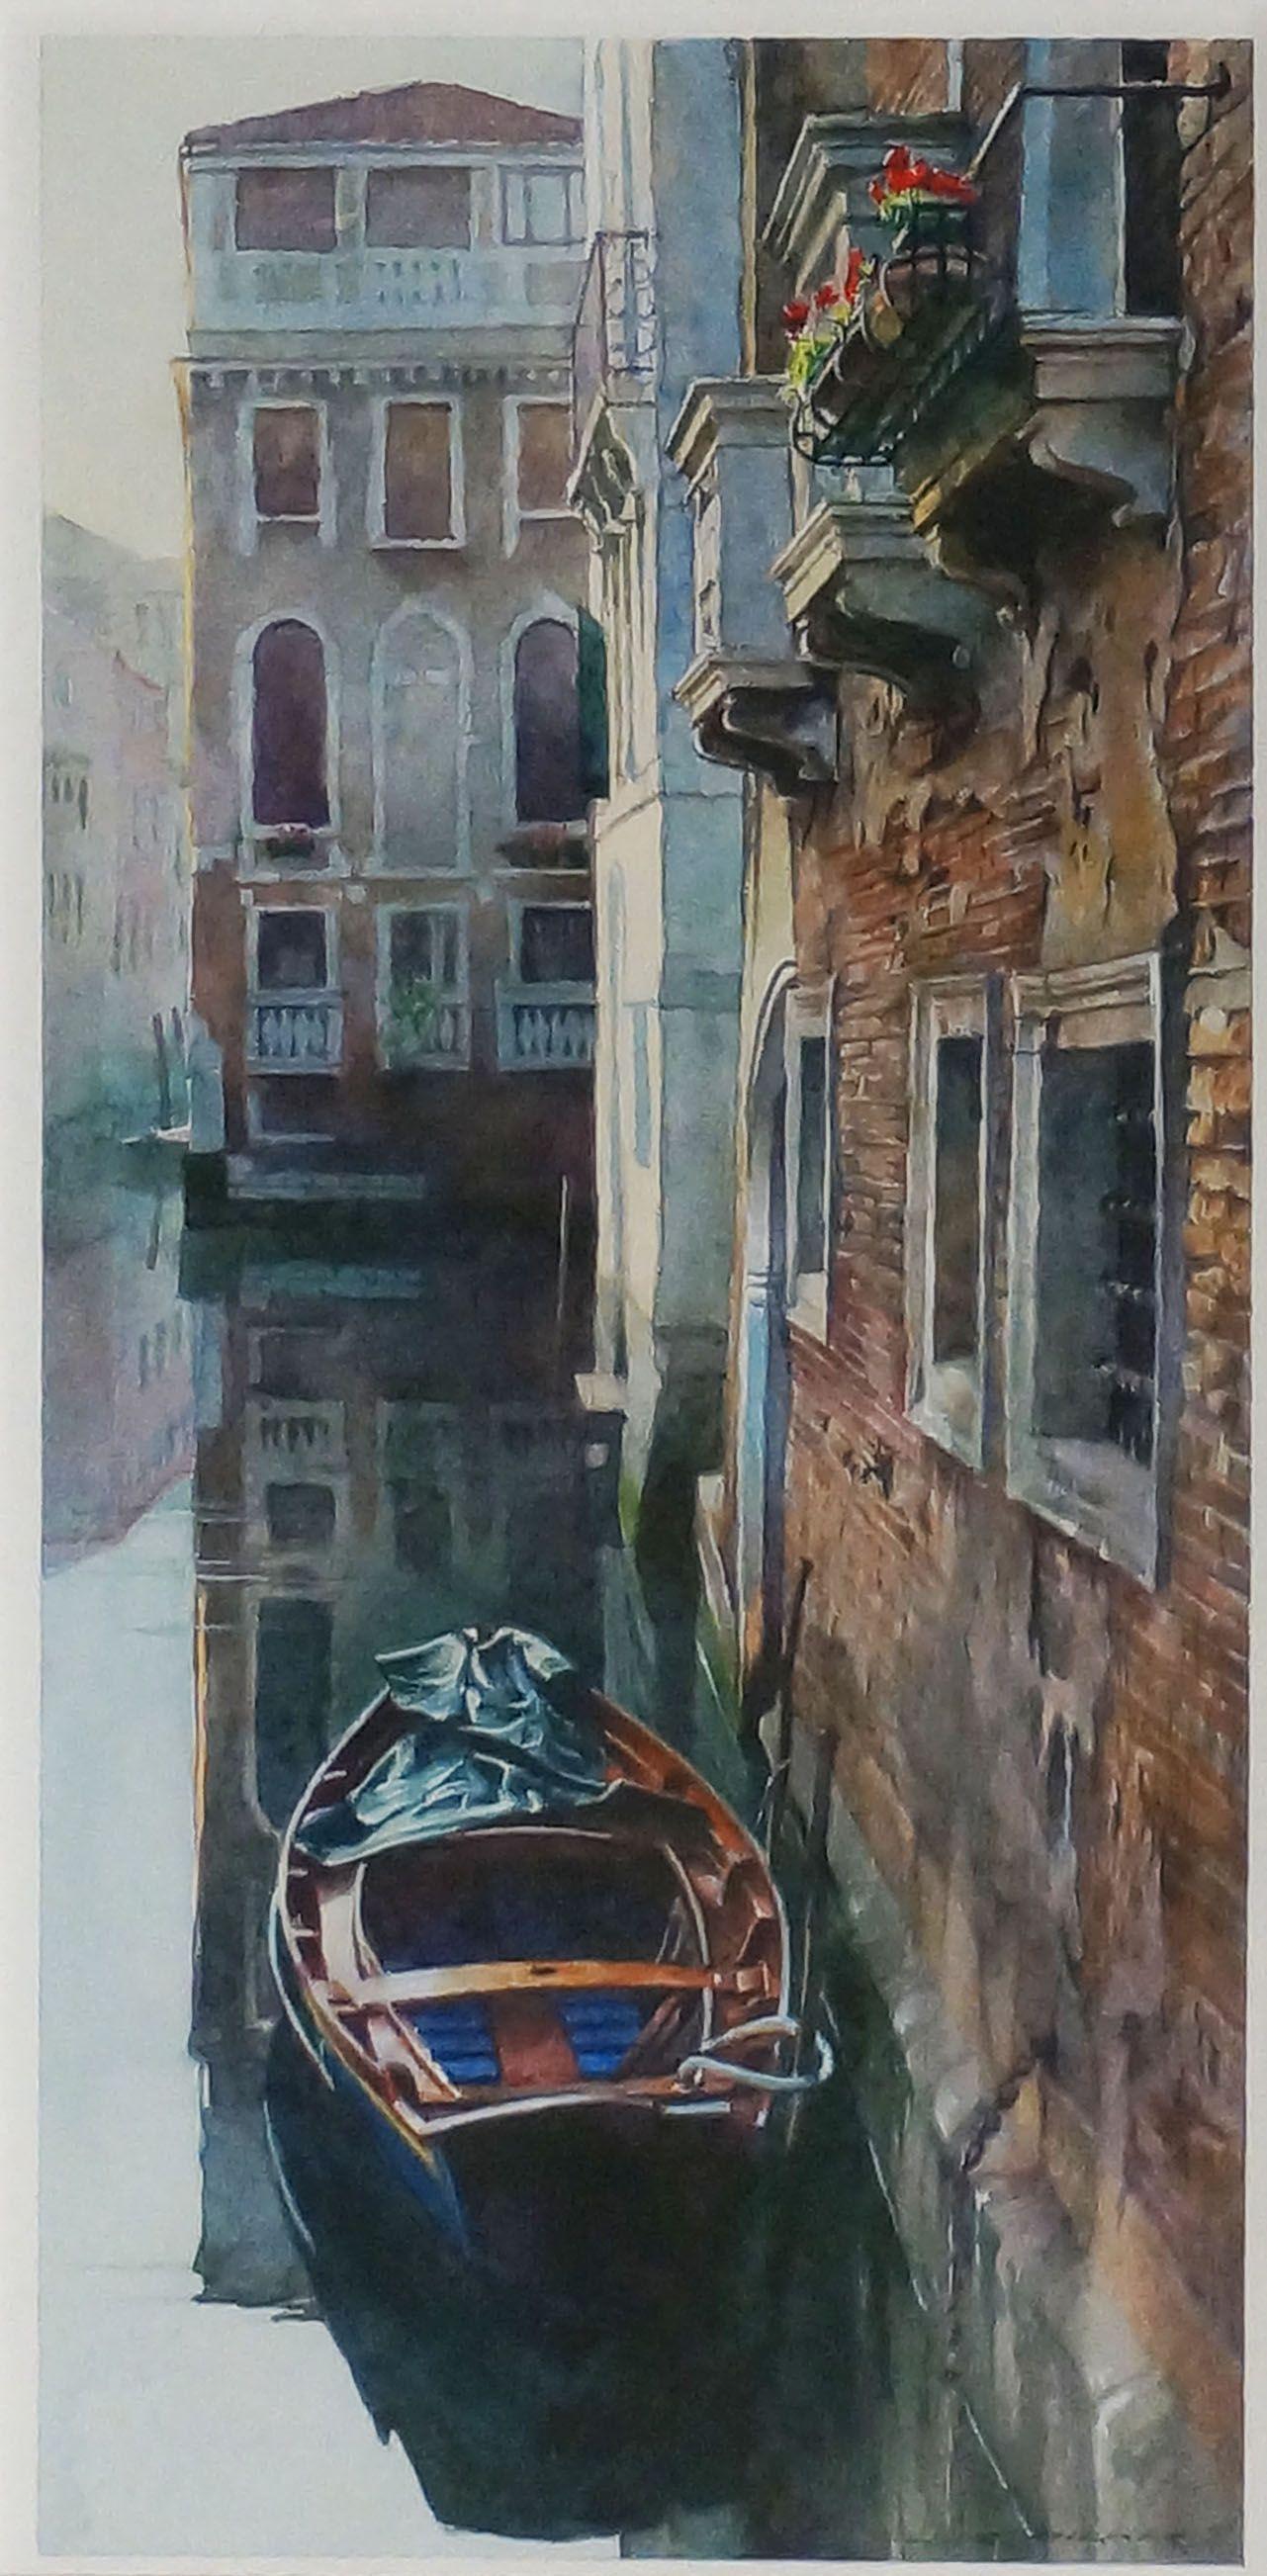 Venice Canal by Stan Miller | J-Art Gallery